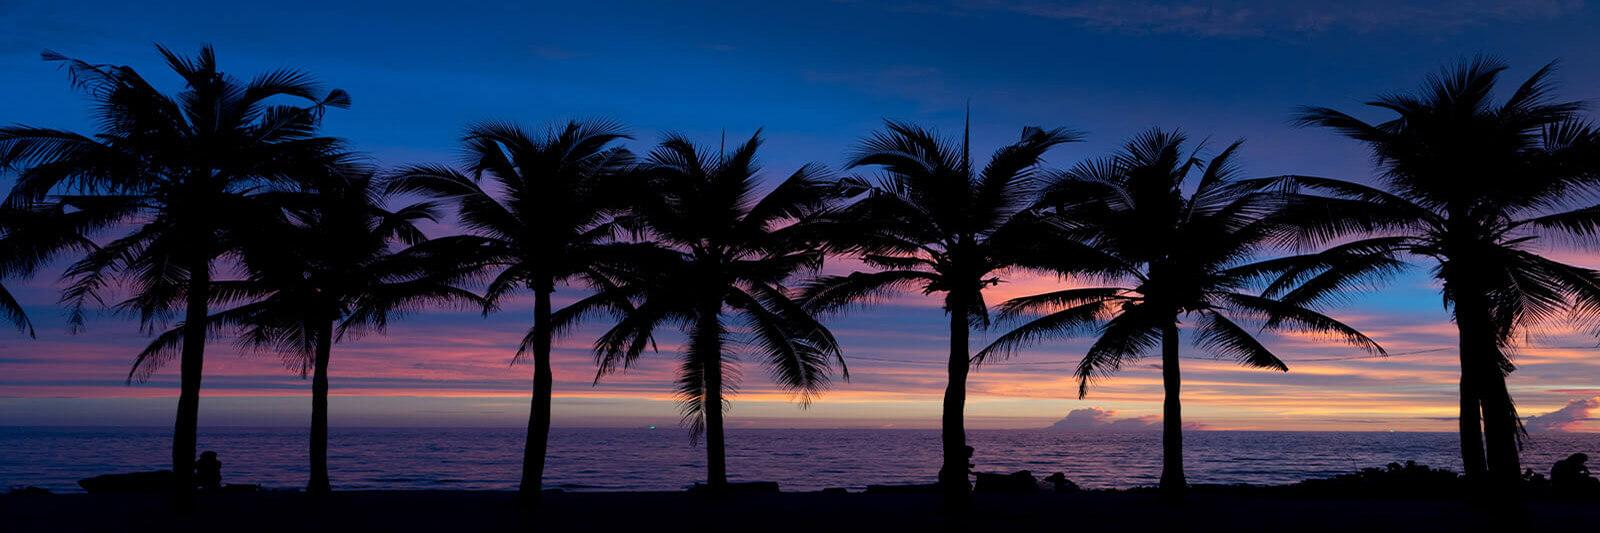 Sunset at the beach on Ko Samet, Thailand